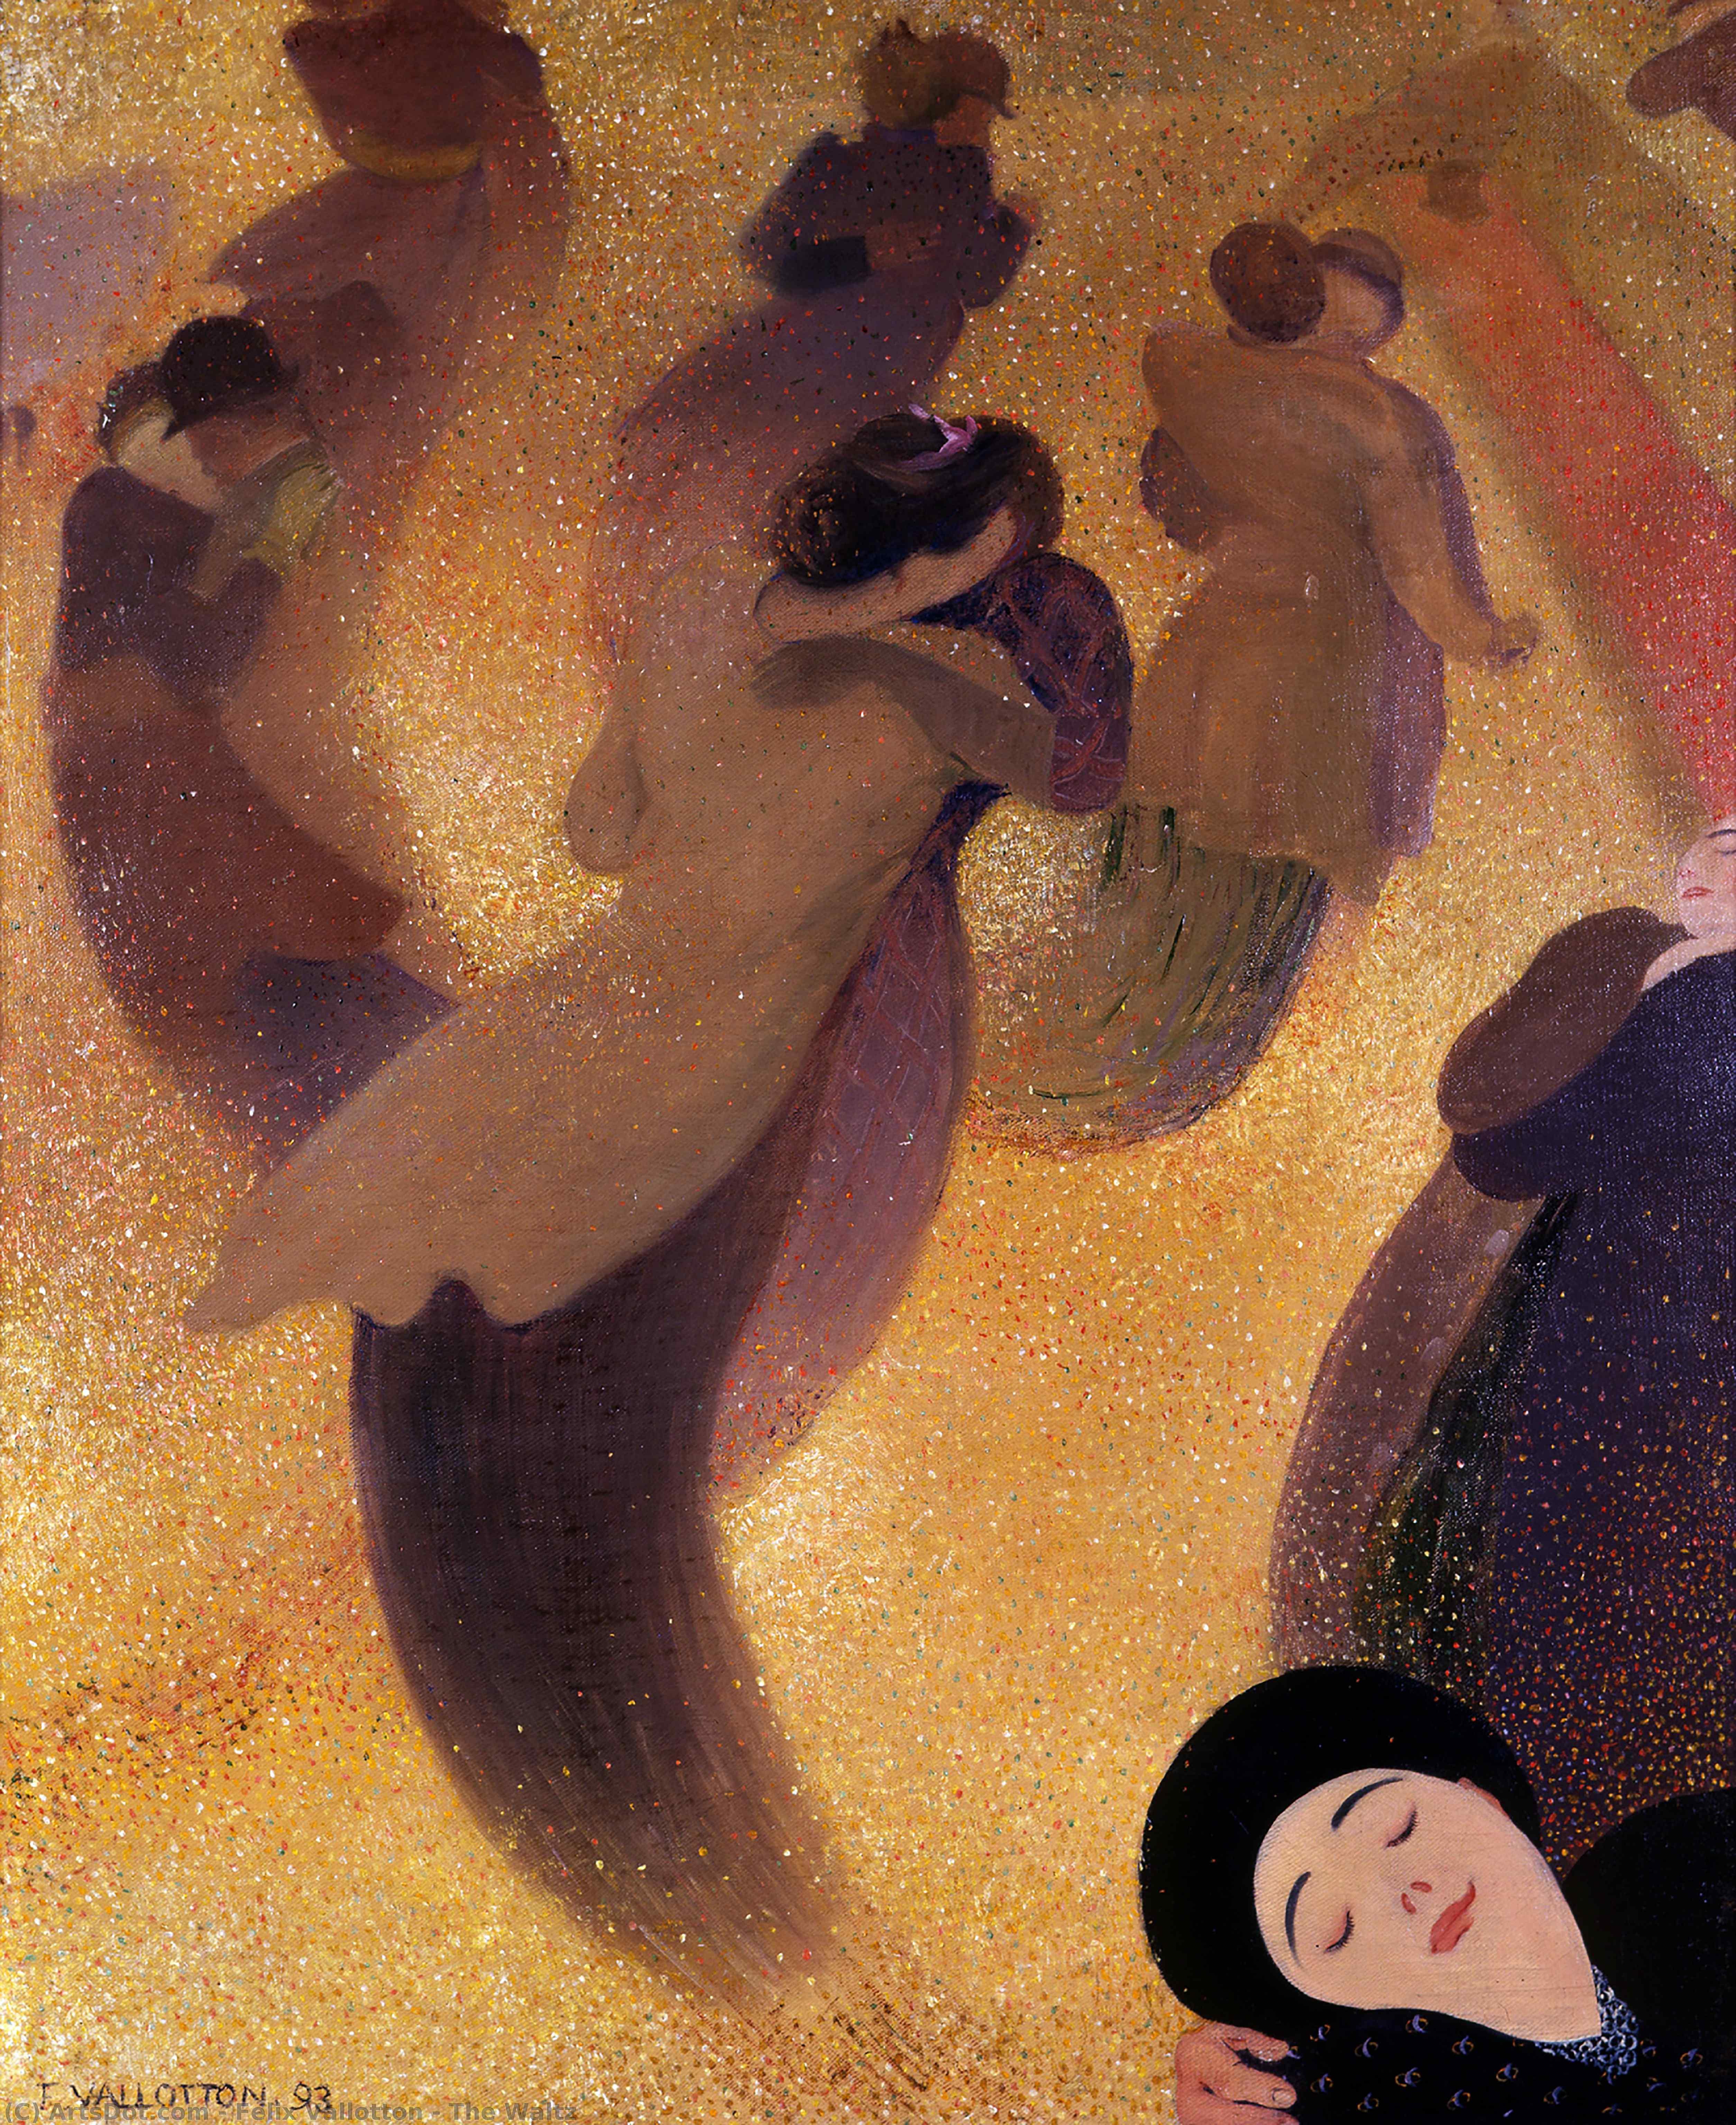 Wikoo.org - موسوعة الفنون الجميلة - اللوحة، العمل الفني Felix Vallotton - The Waltz